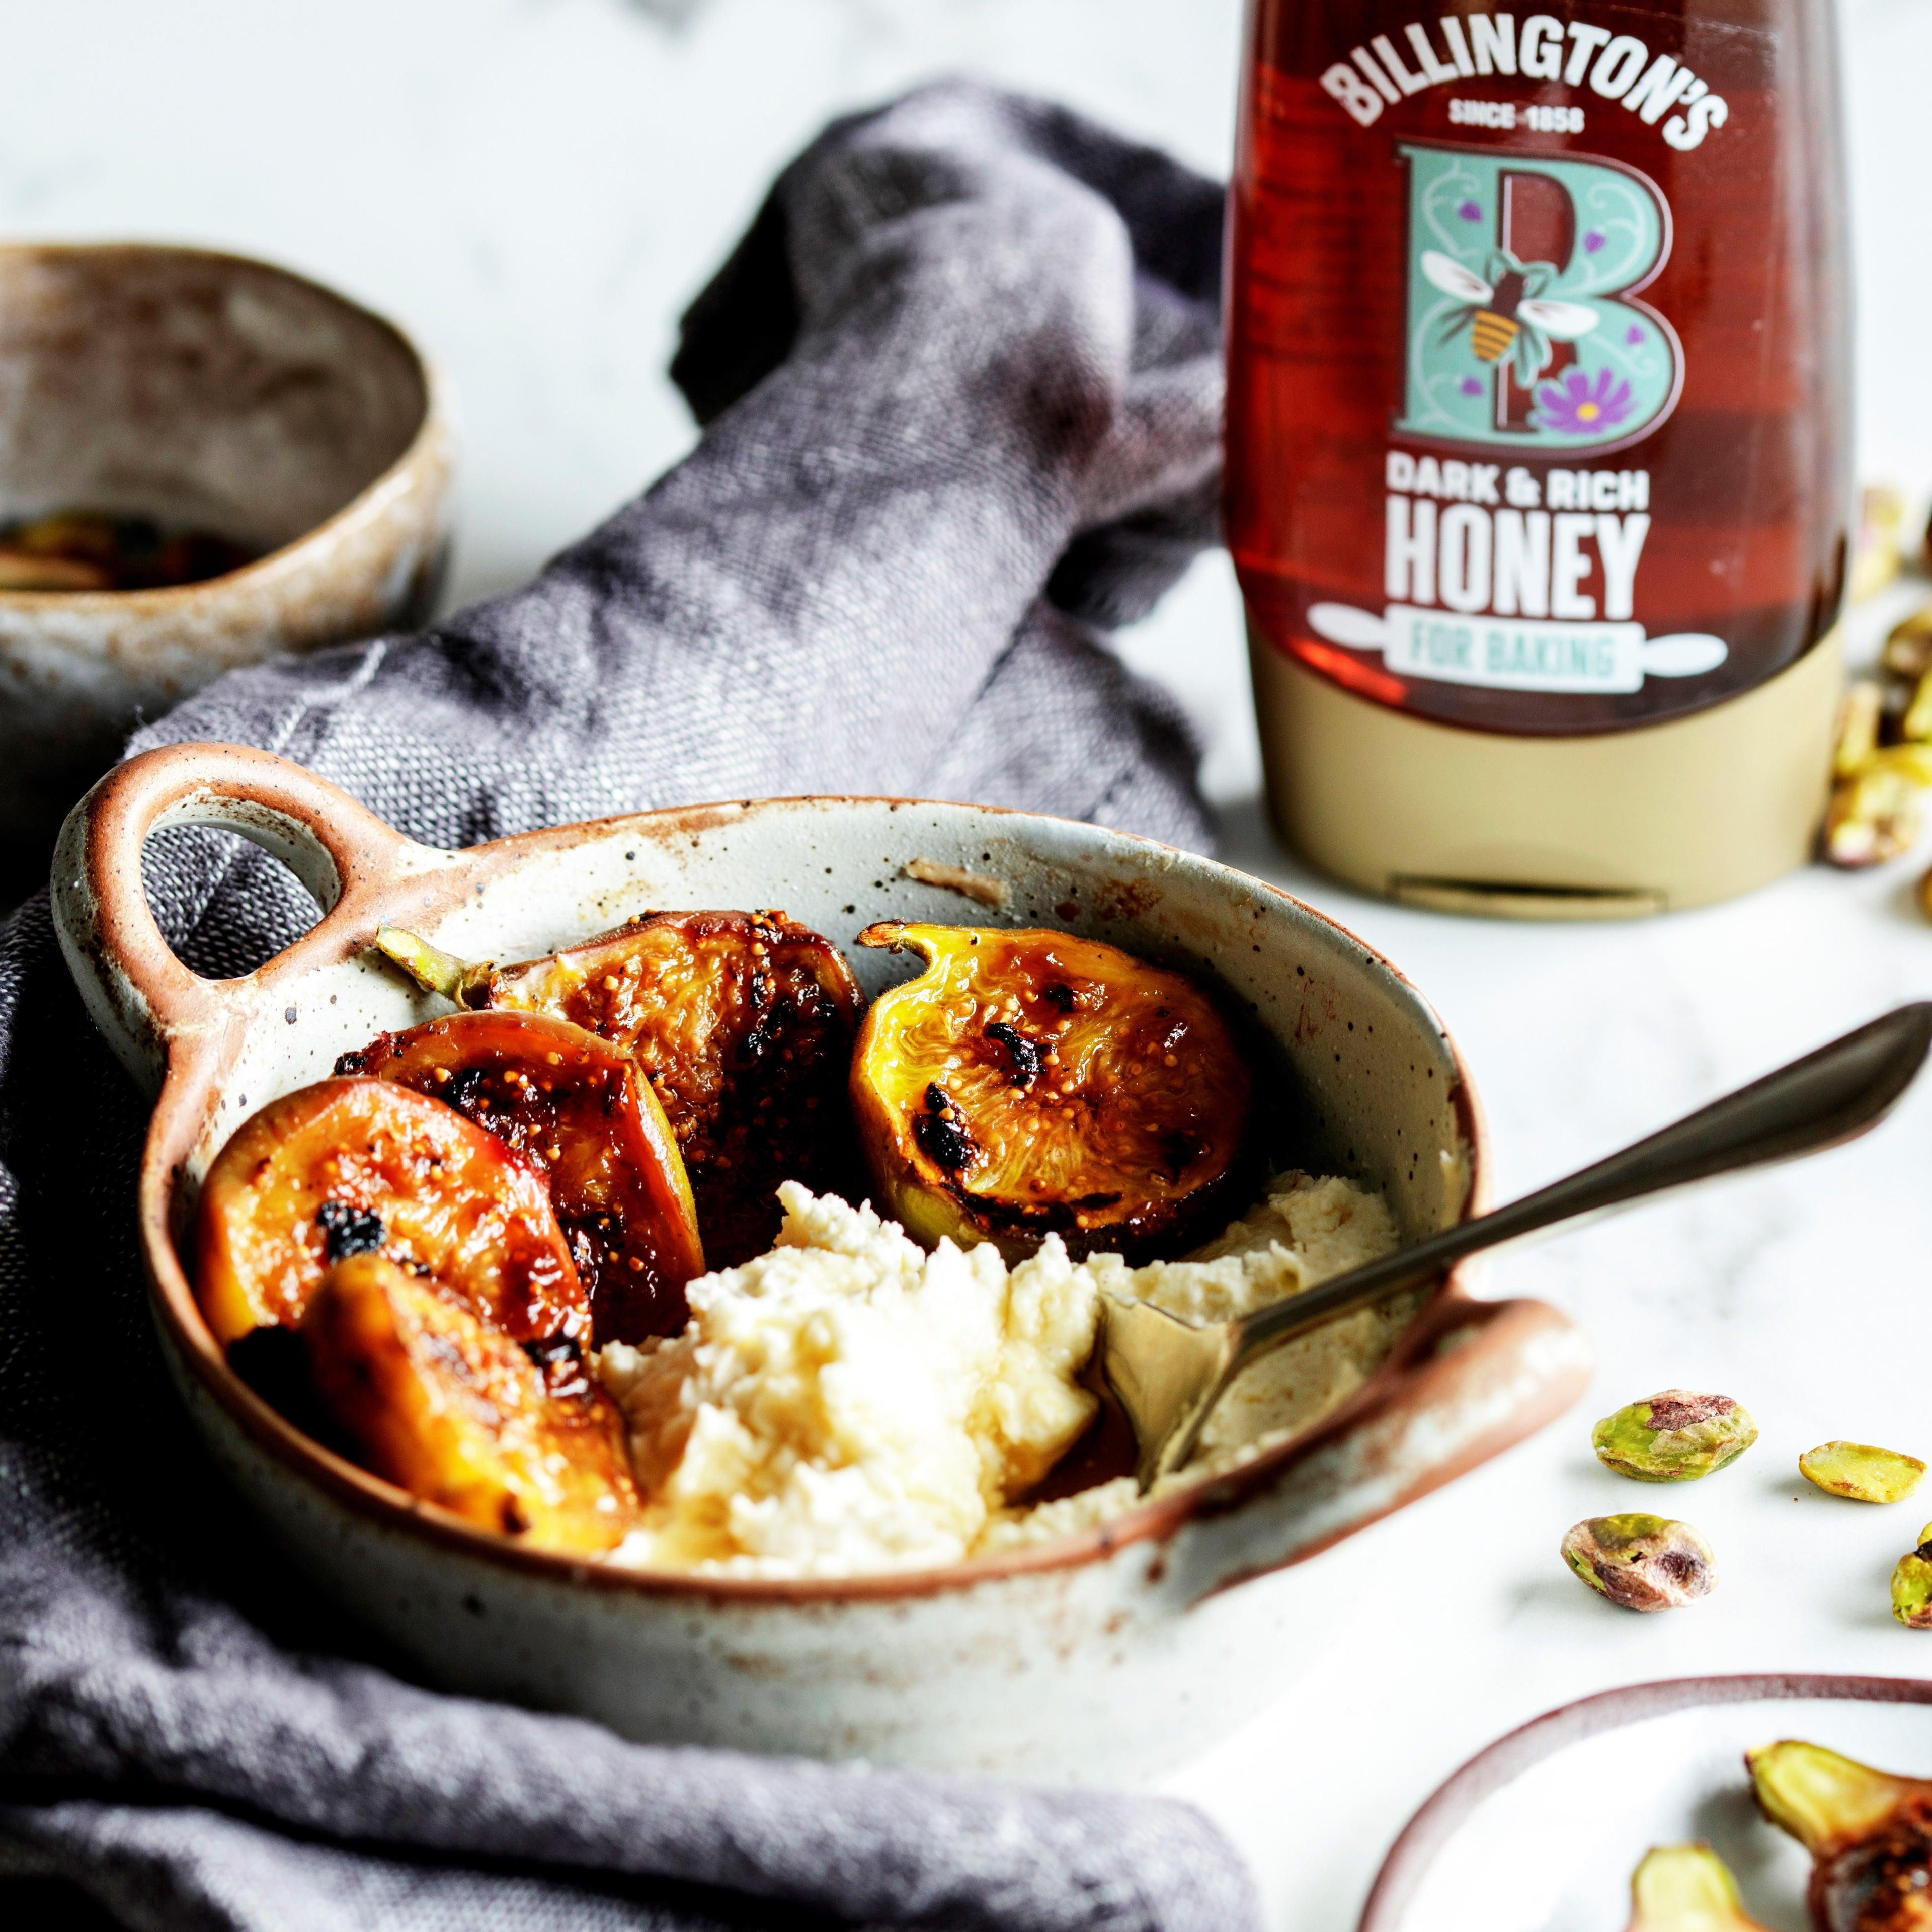 Billington-s-whipped-mascarpone-cream,-honey-roasted-figs-pistachio-dessert-web_1.jpg